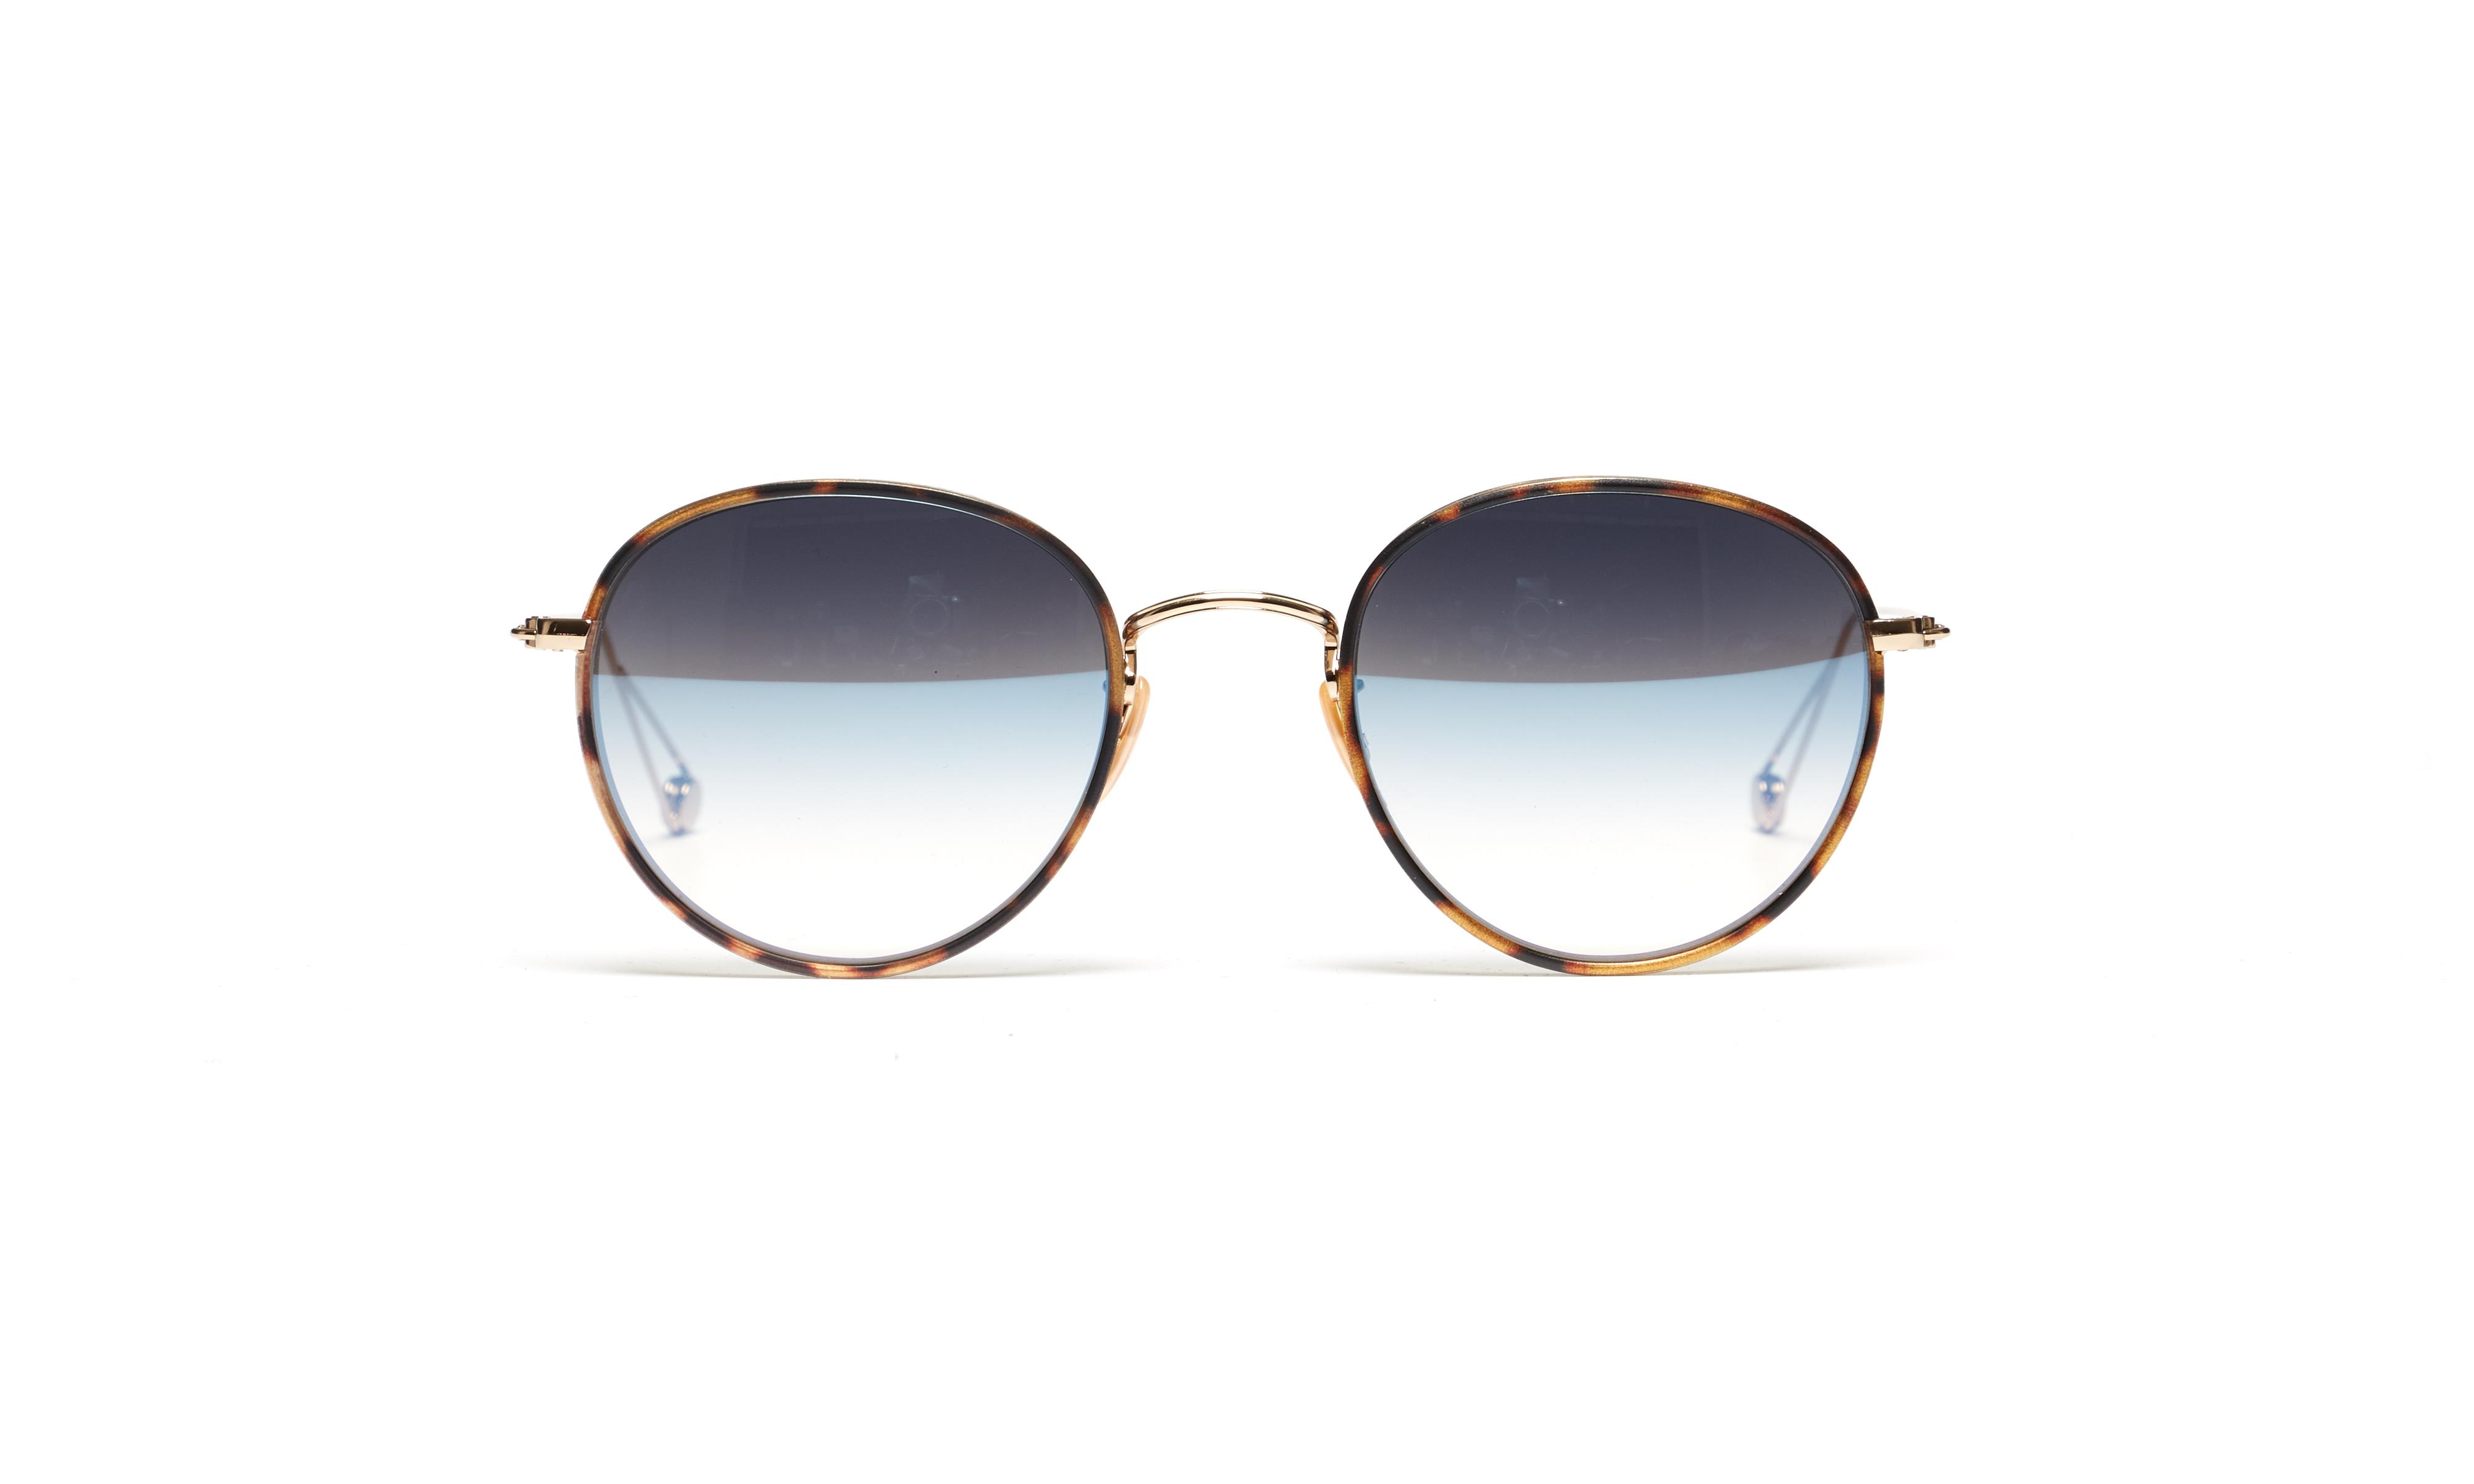 Paloma sunglasses - Metallic Garrett Leight 5MhDzof